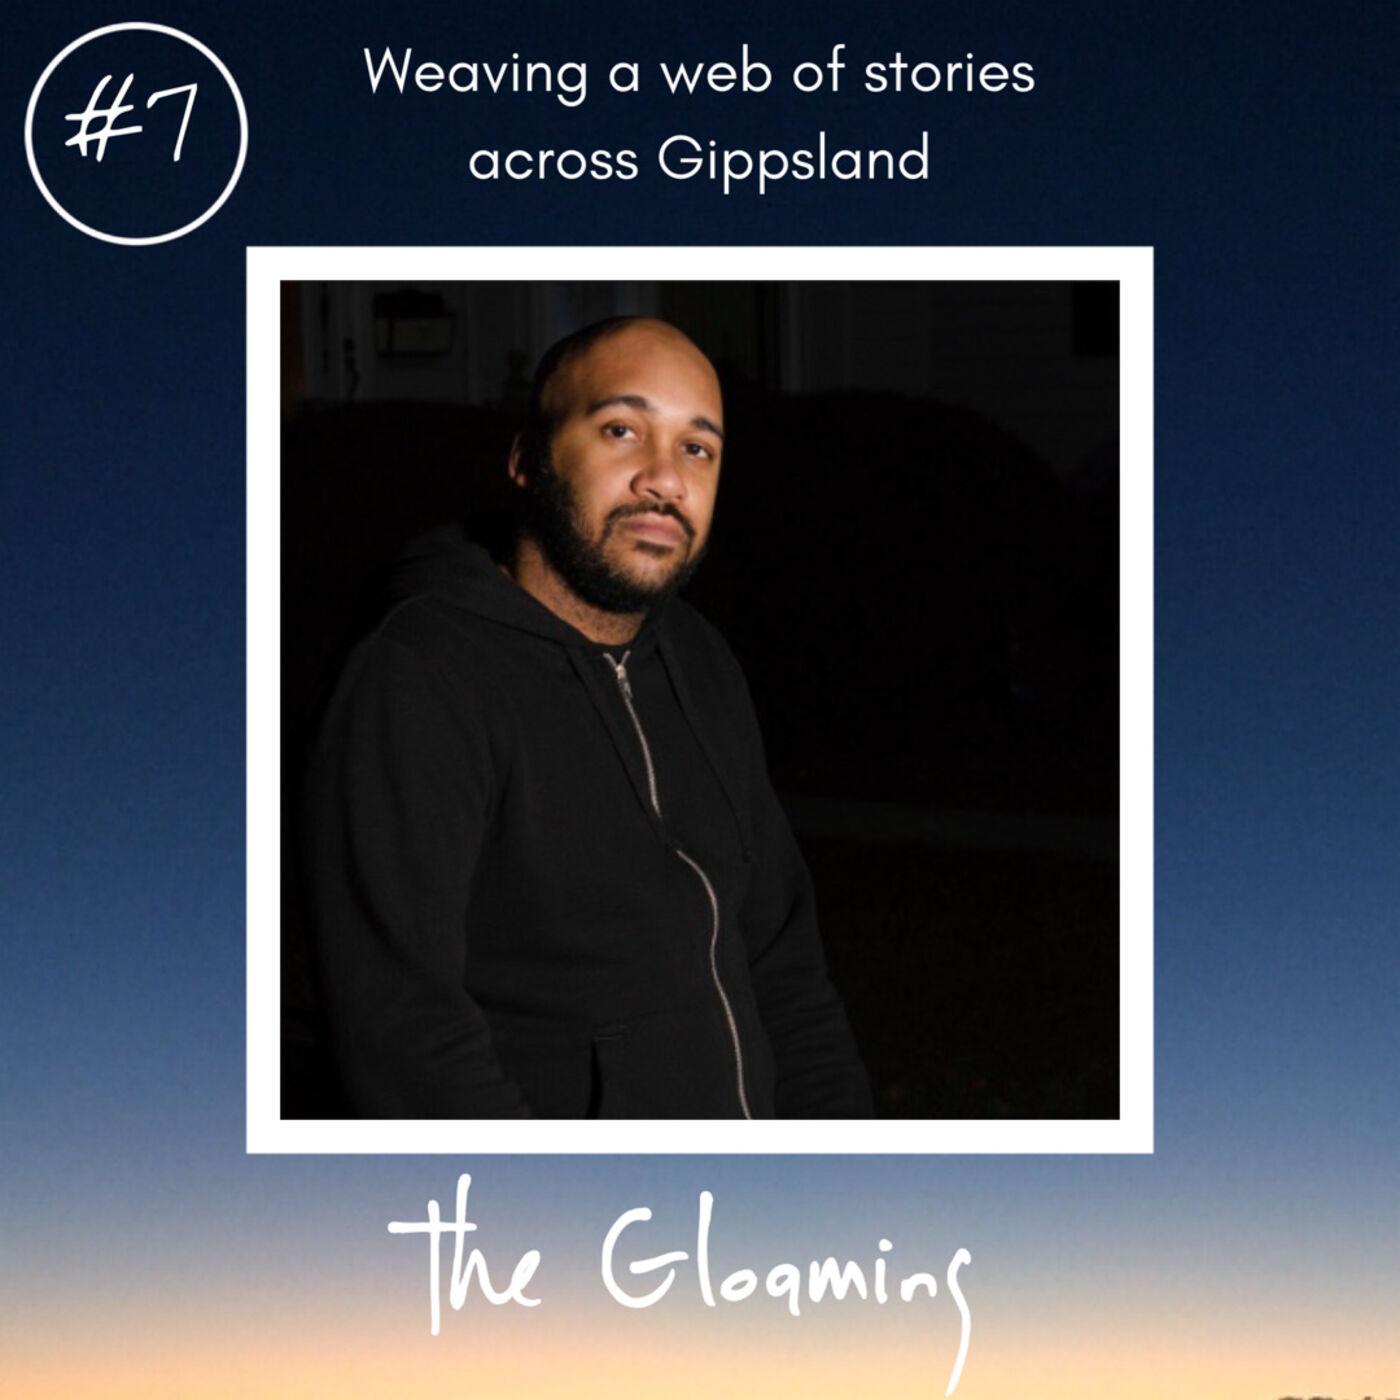 TG7: Weaving a web of stories across Gippsland